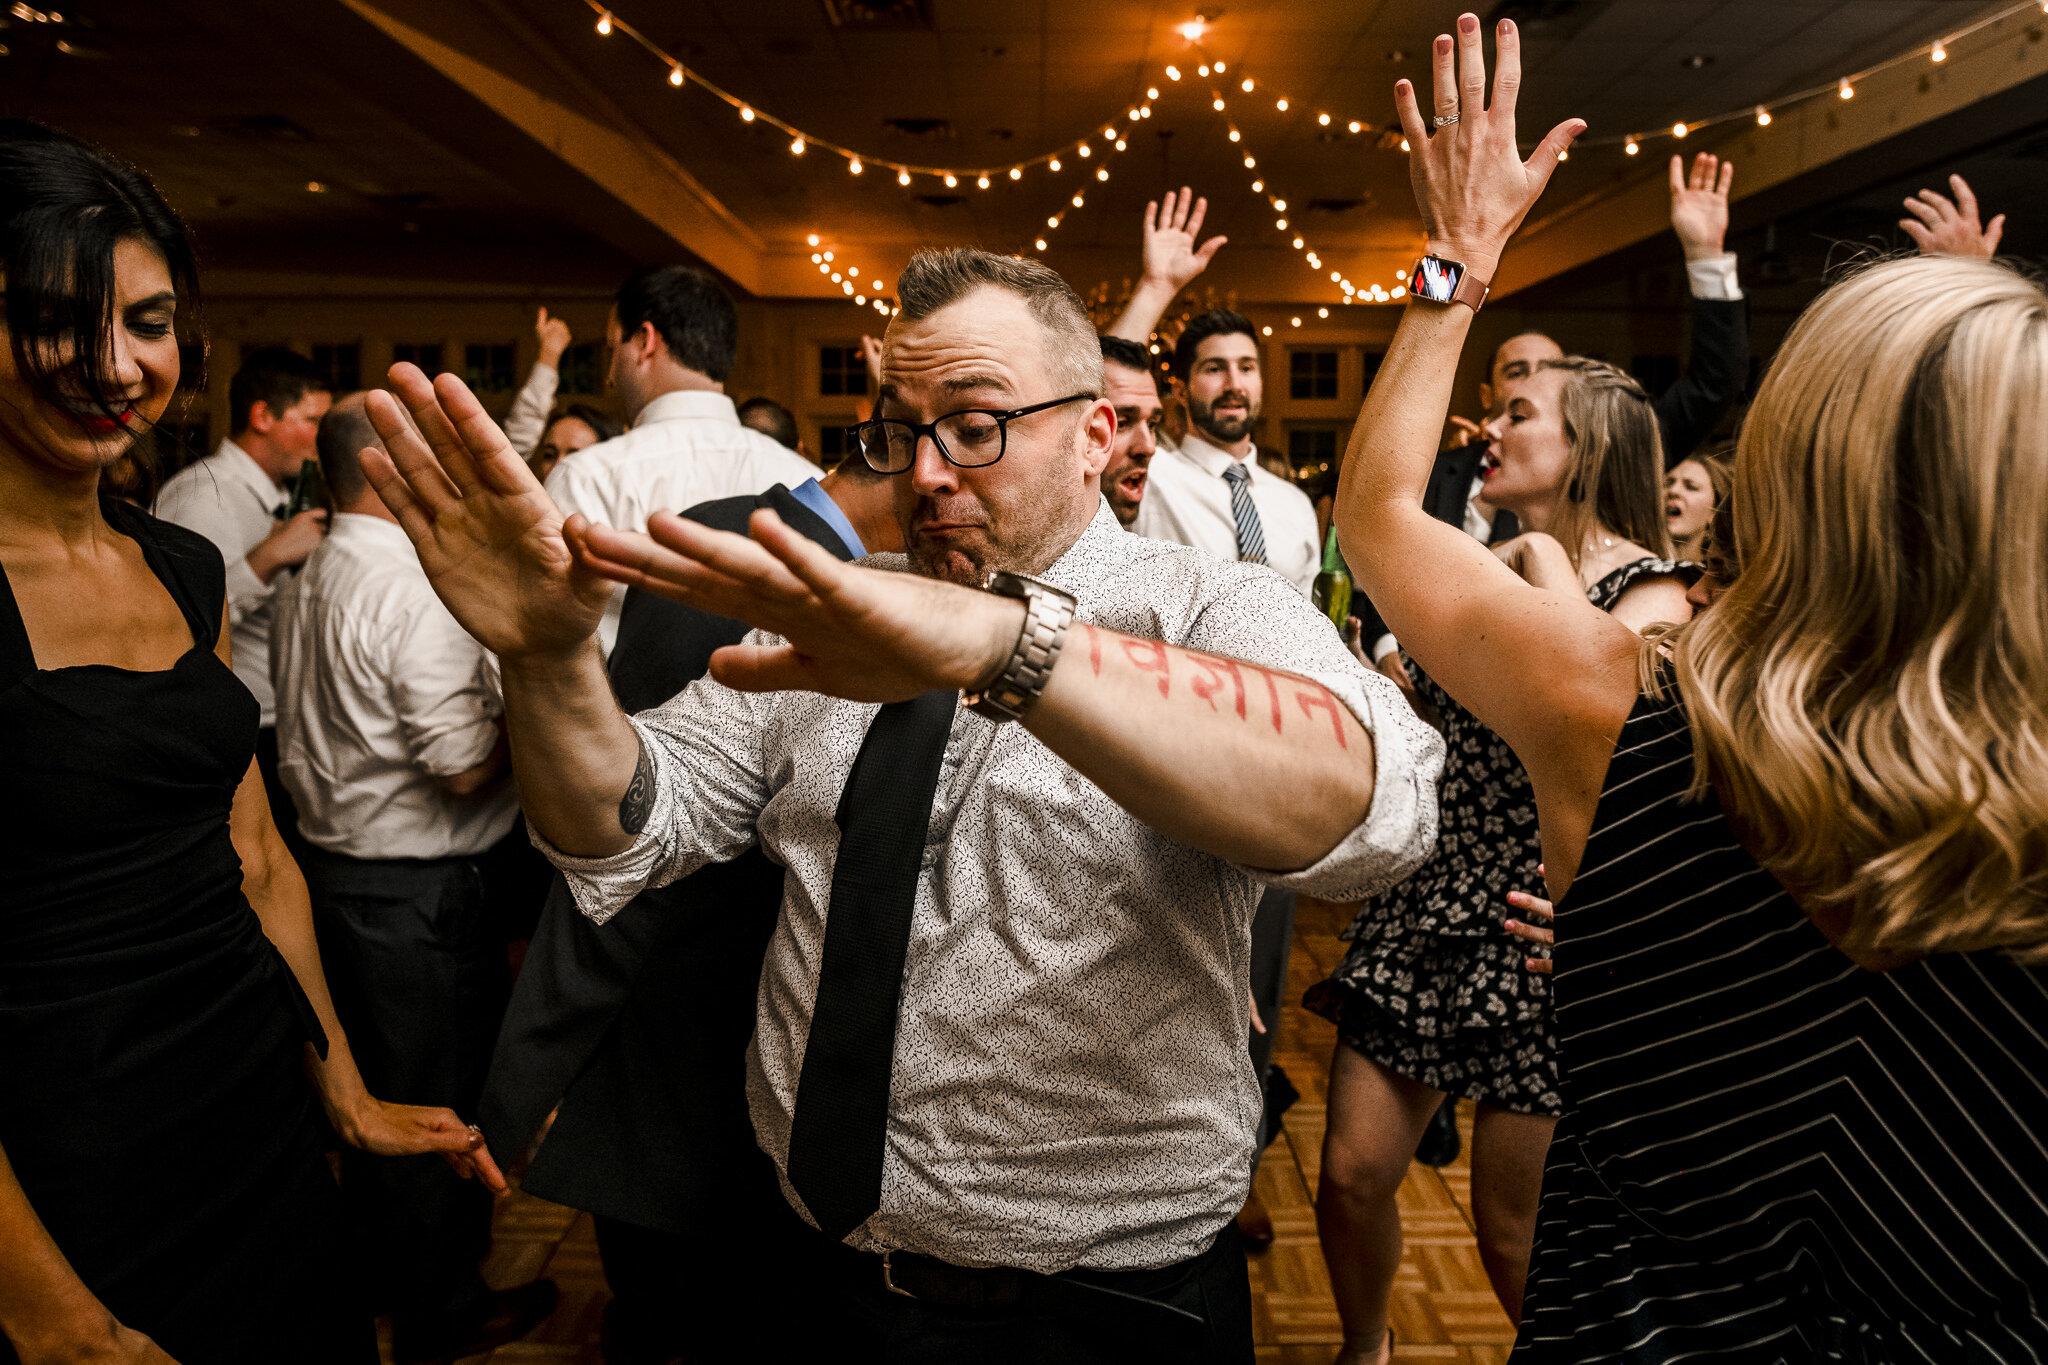 Coyle-Forsgate-Country-Club-Wedding-Photographer-53.JPG